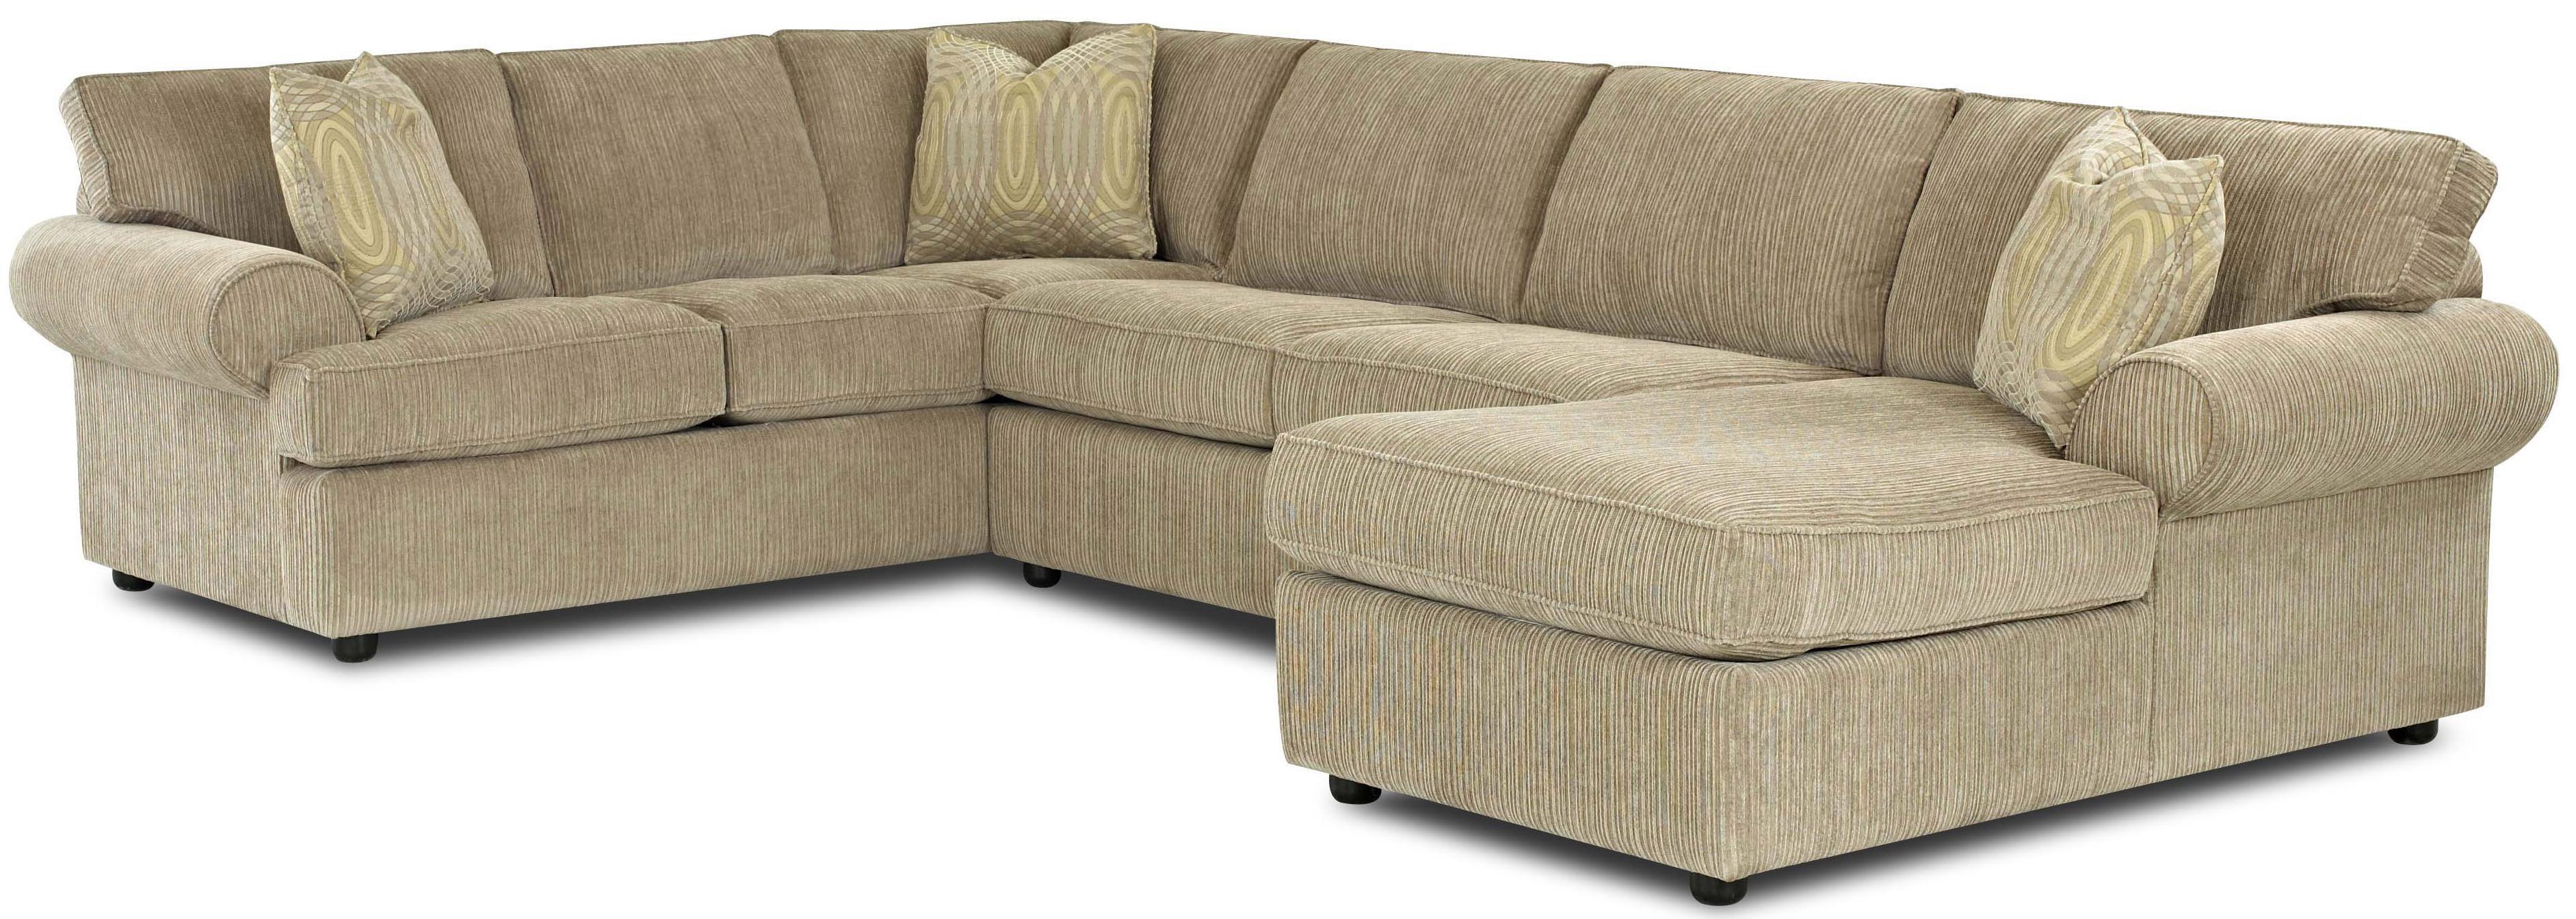 Klaussner julington transitional sectional sofa with for Transitional sectional sofa sleeper